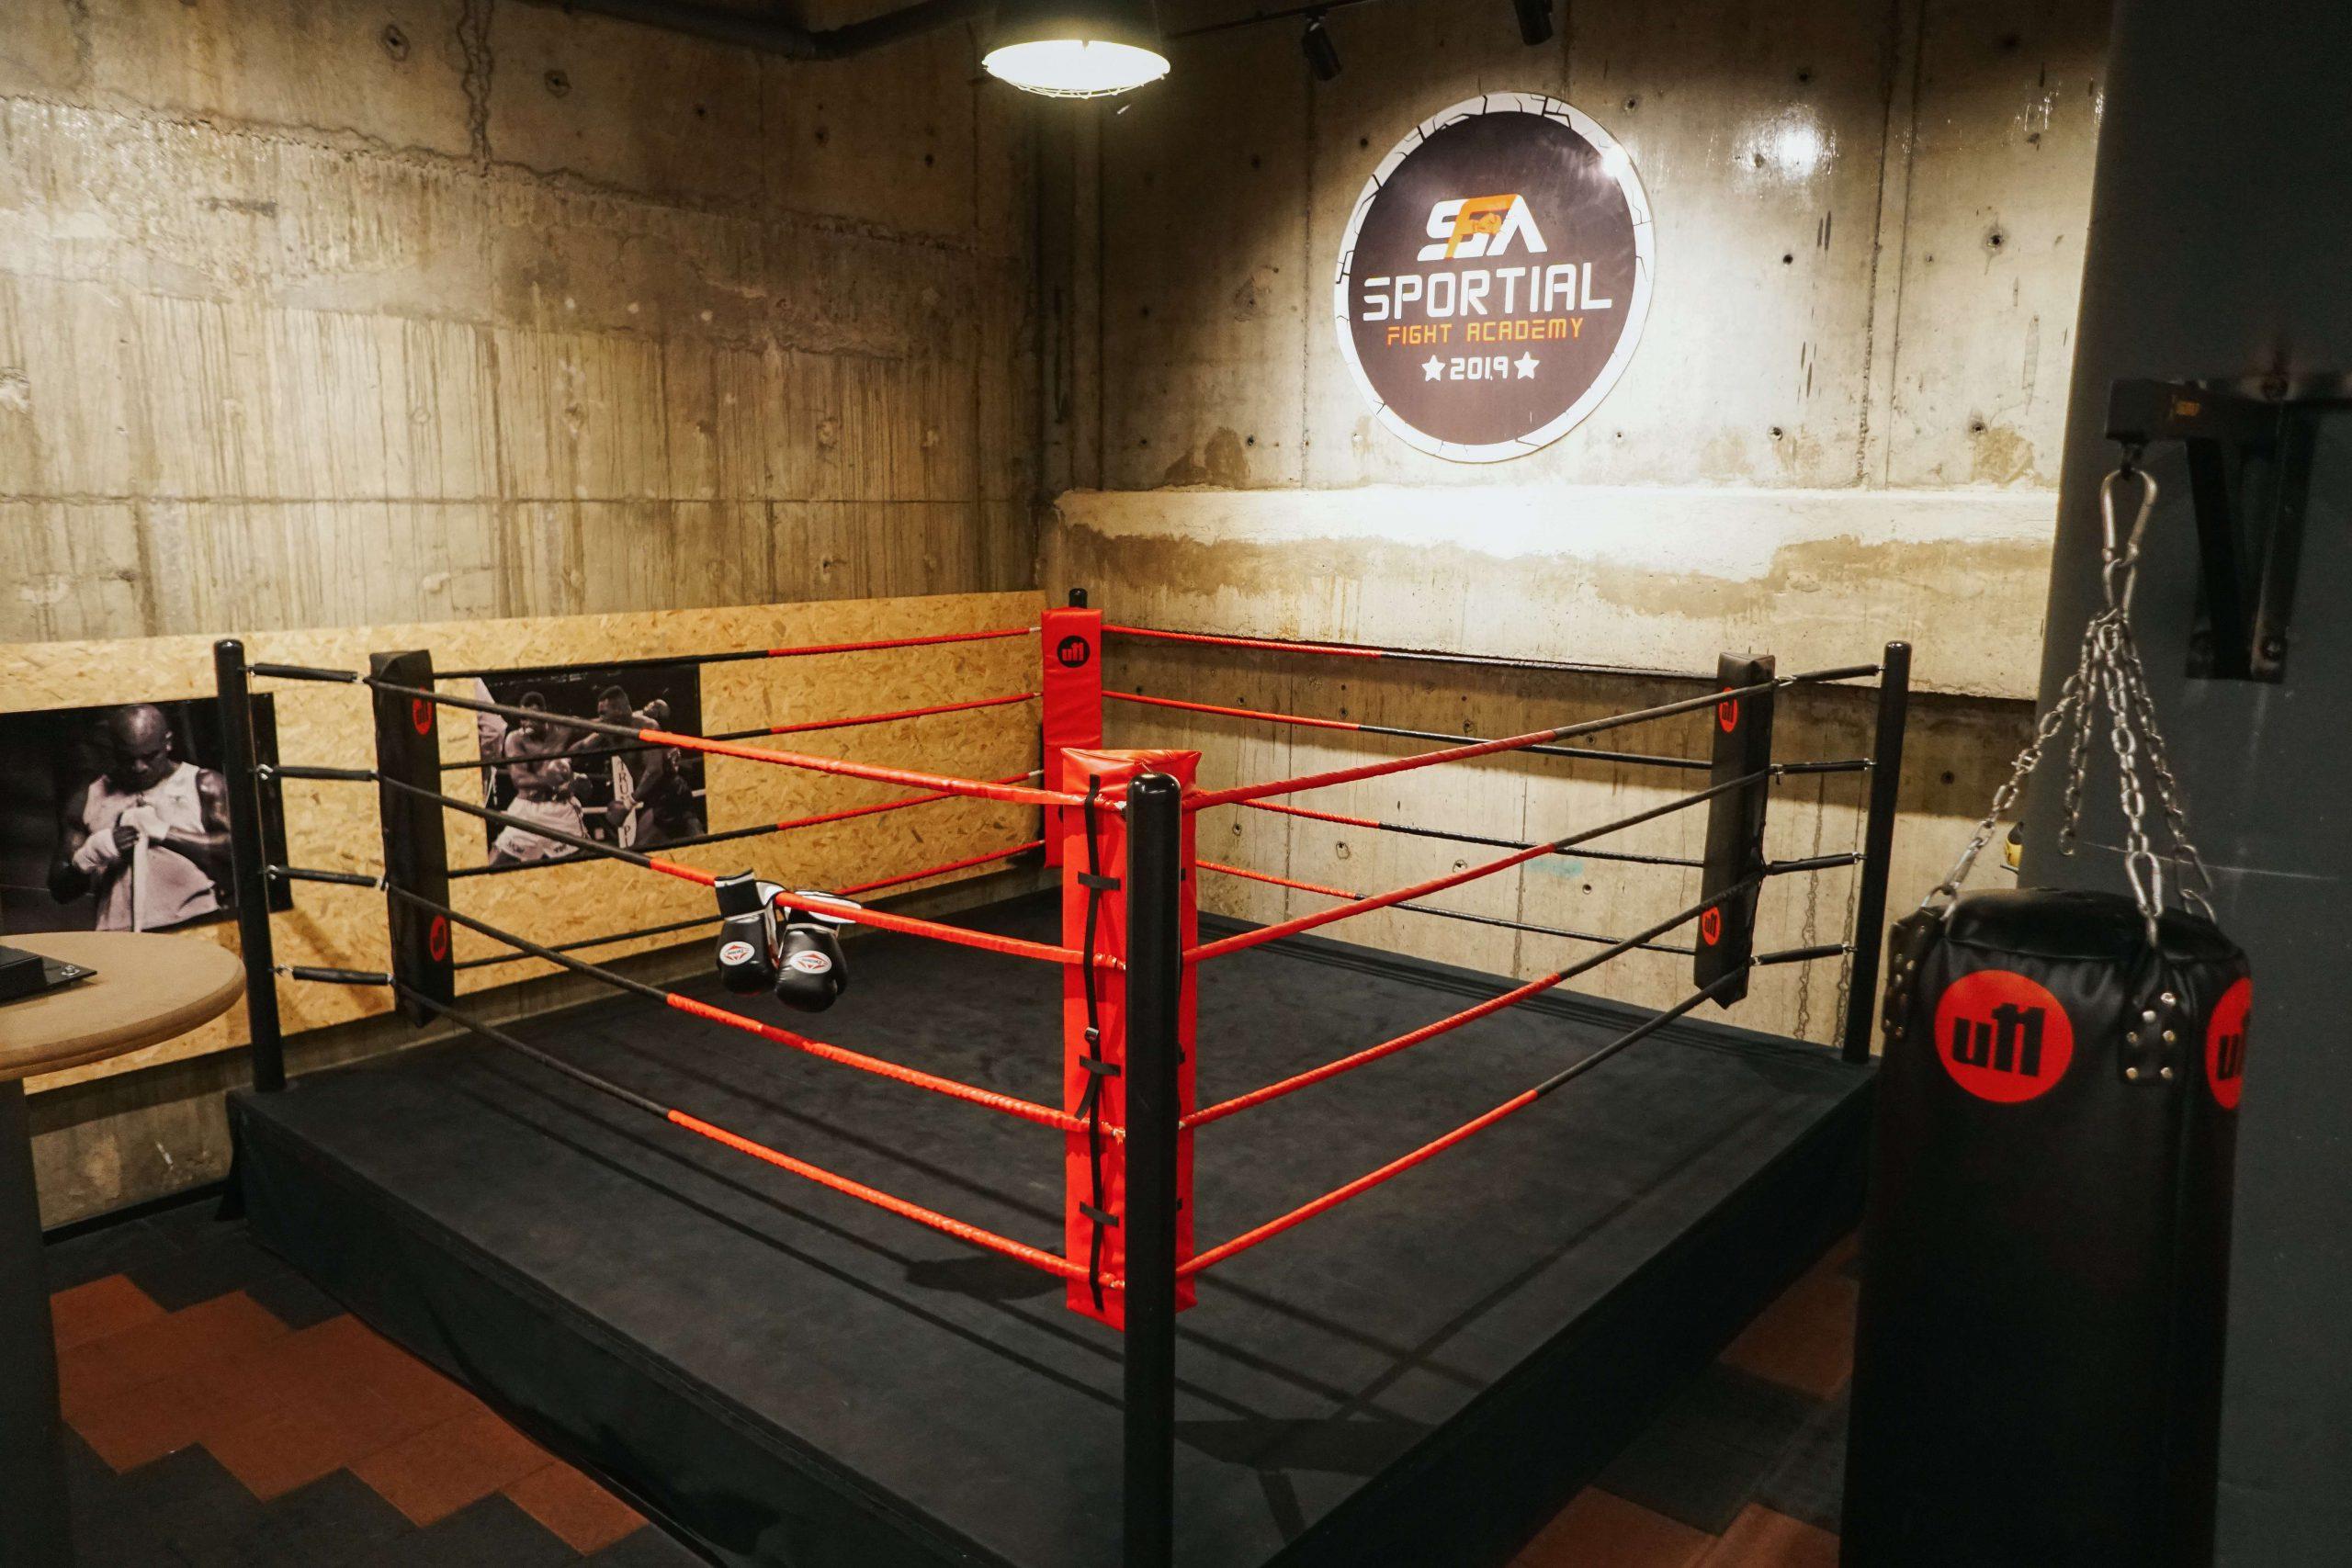 sportial-maltepe-boks-salonu-ve-kursu